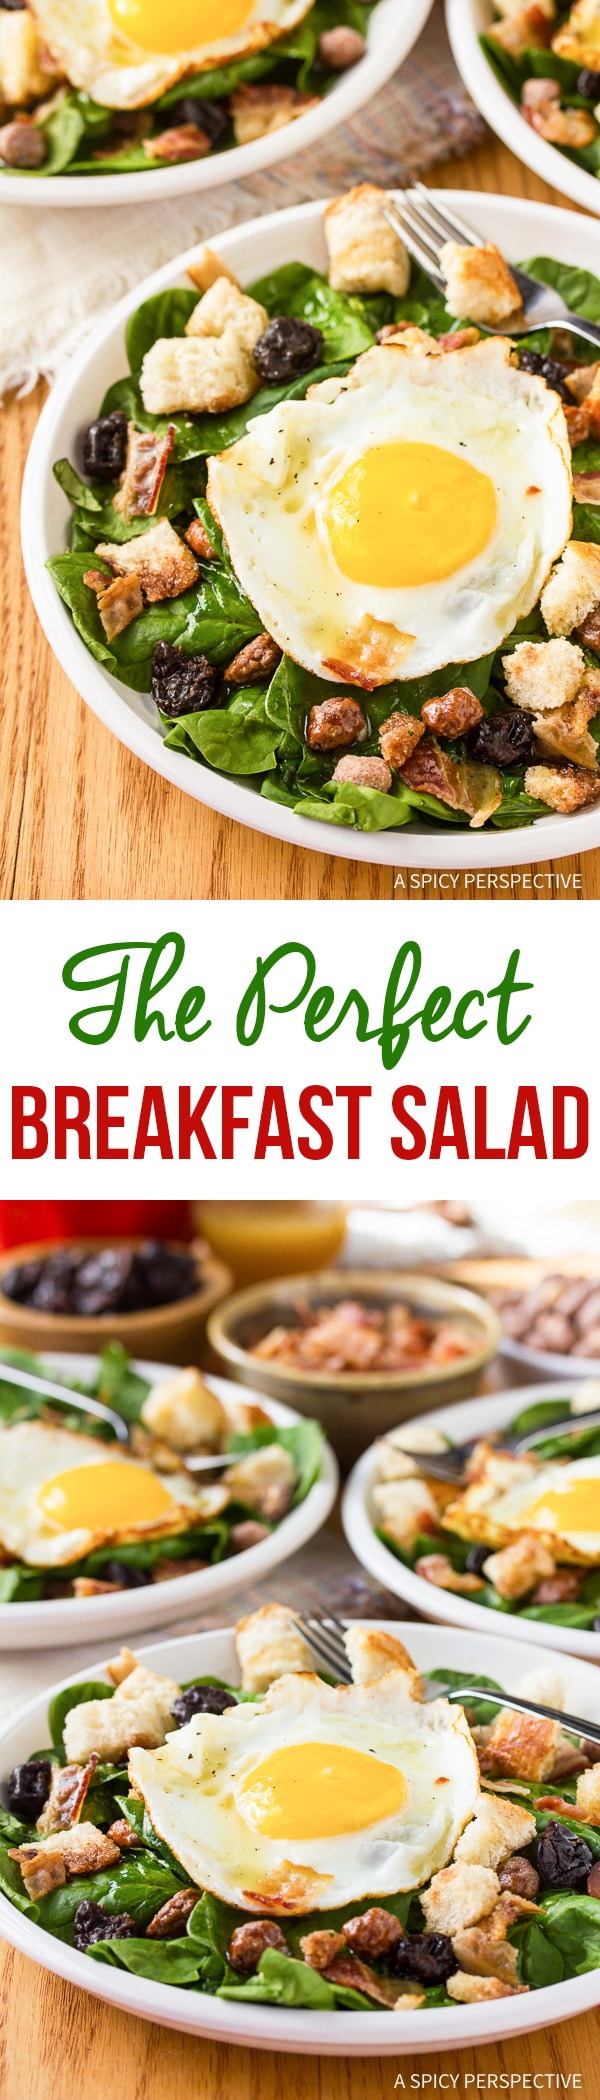 The Breakfast Salad Recipe with Cinnamon Toast Croutons and Maple Vinaigrette